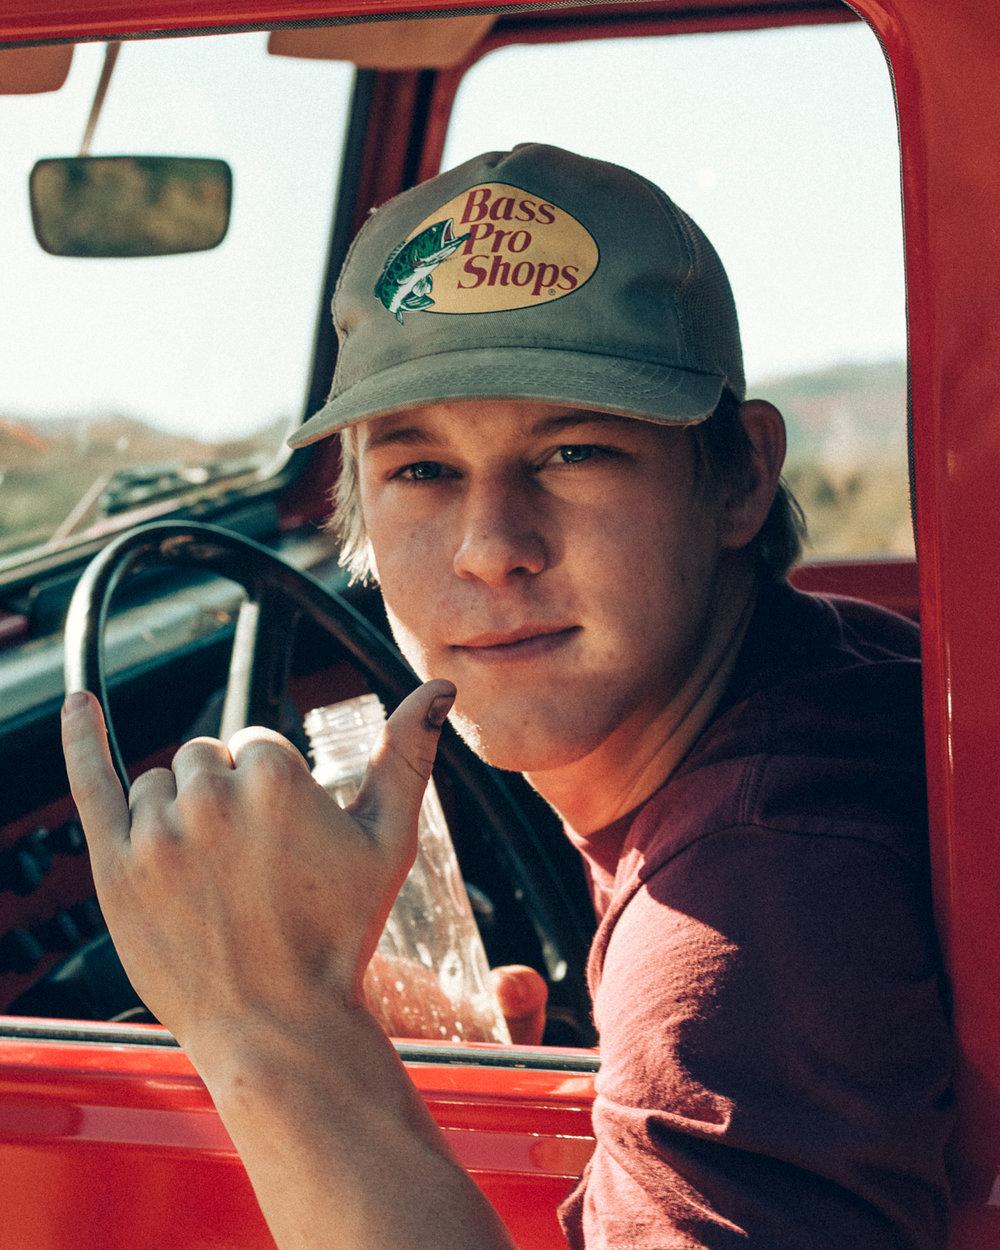 Tim_Cole-automotive-photography-car-photographer-fj40 2.jpg